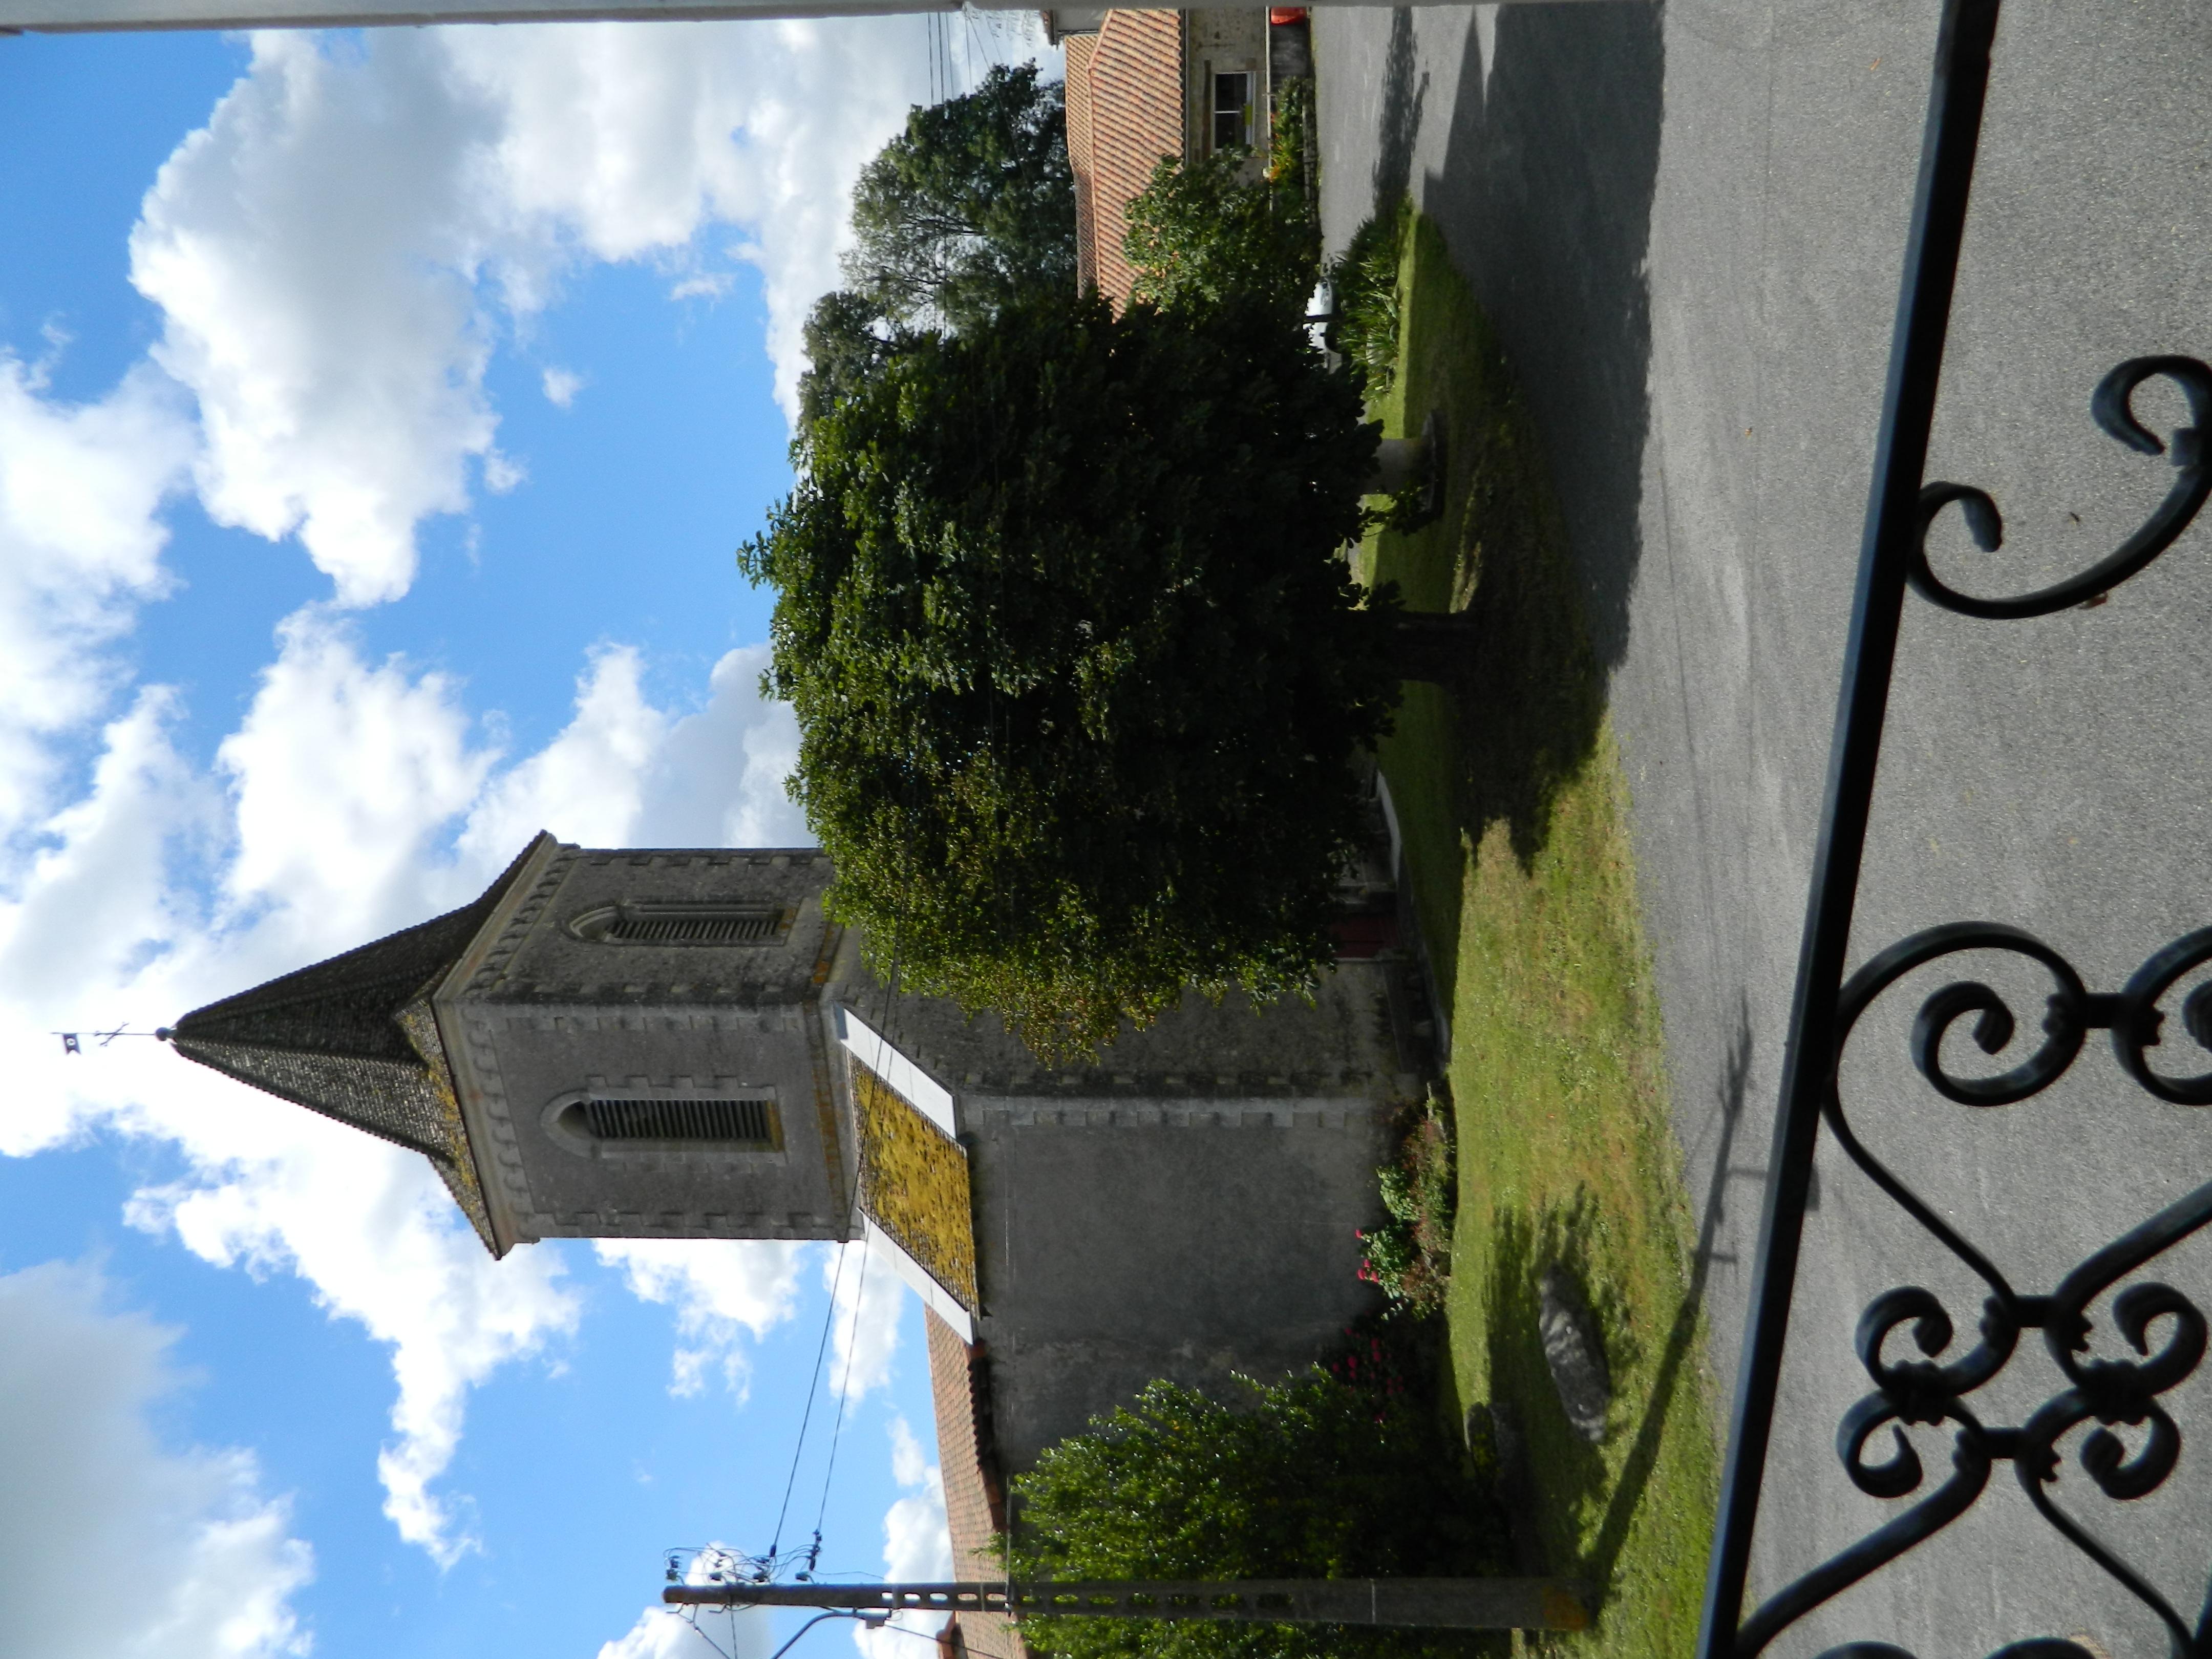 Marronnier view